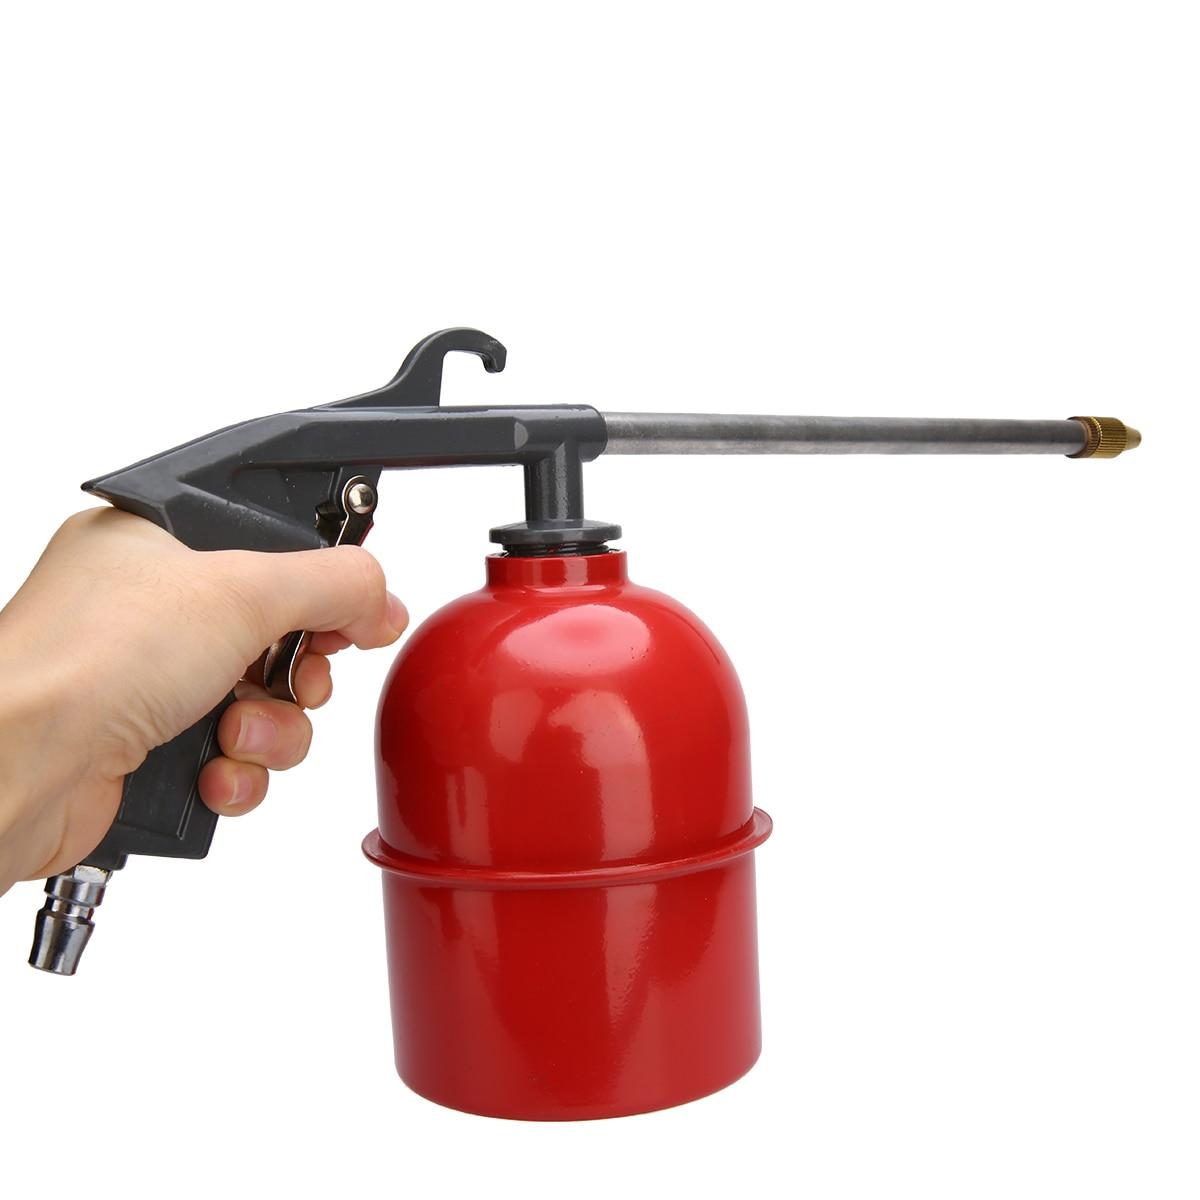 High Pressure Car Engine Warehouse Cleaner Washer Gun Air Pressure Spray Dust Blow Oil Compressor Dust Wash Tool Spray Gun